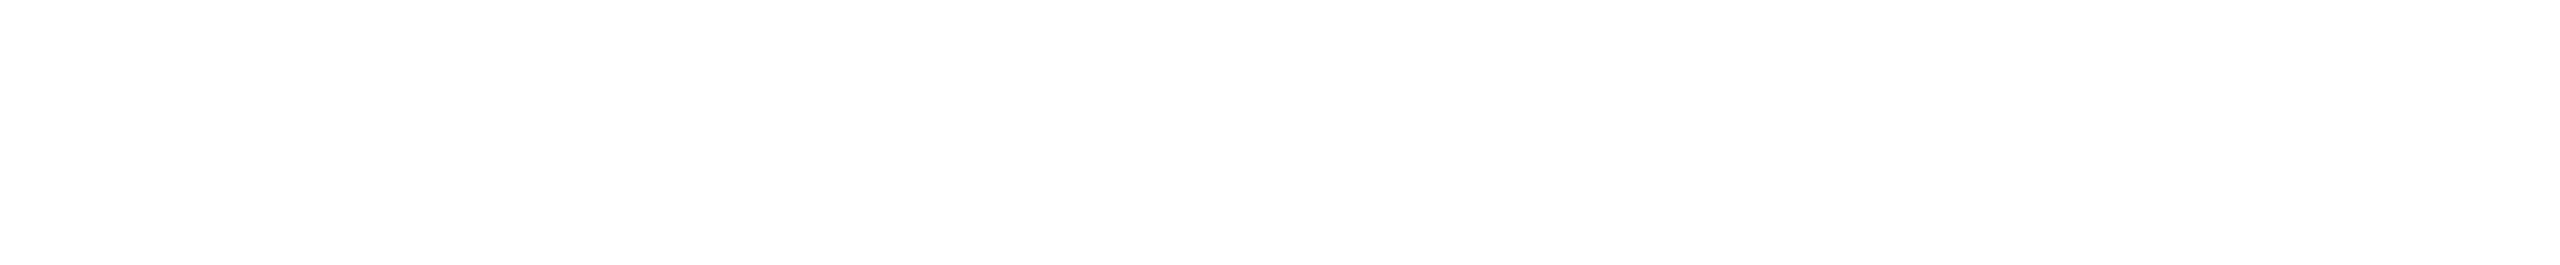 retirada de uralita de bidones de agua en madrid